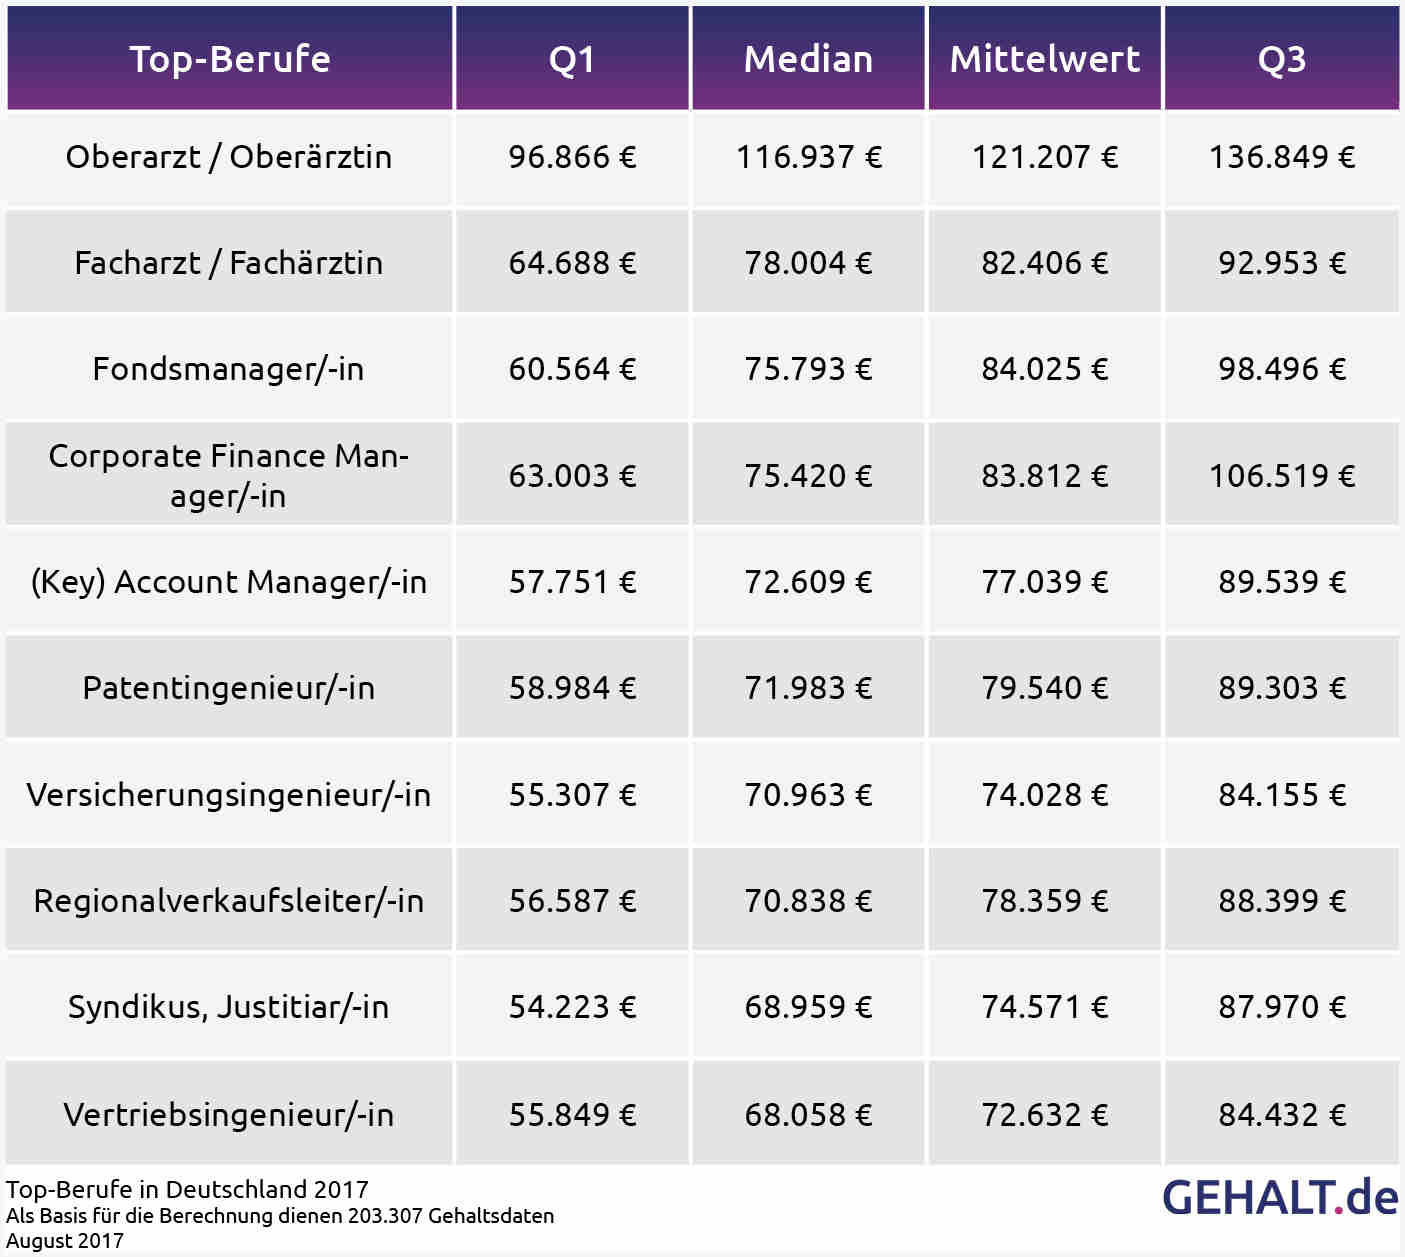 Unique Accounting Manager Gehalt Model - FORTSETZUNG ARBEITSBLATT ...